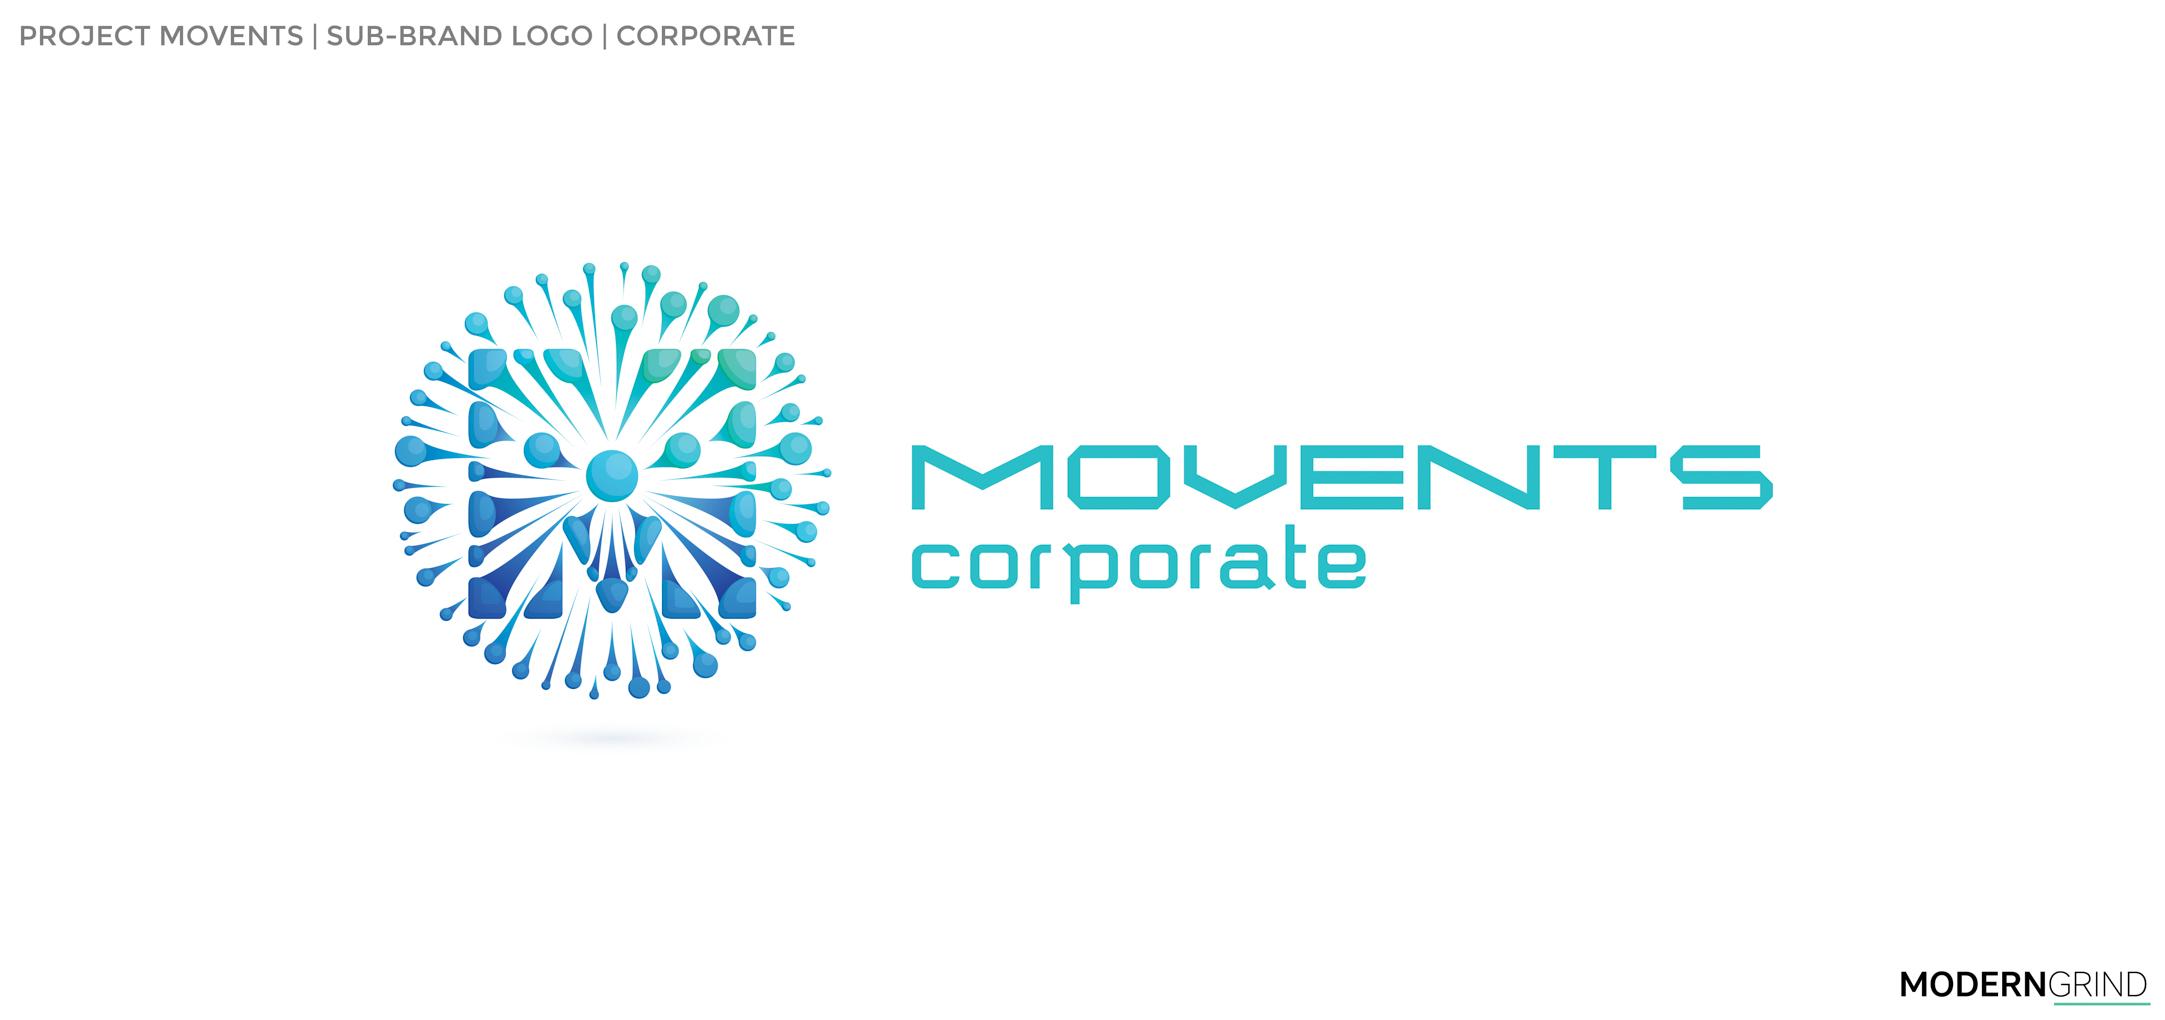 movents_showcase-5